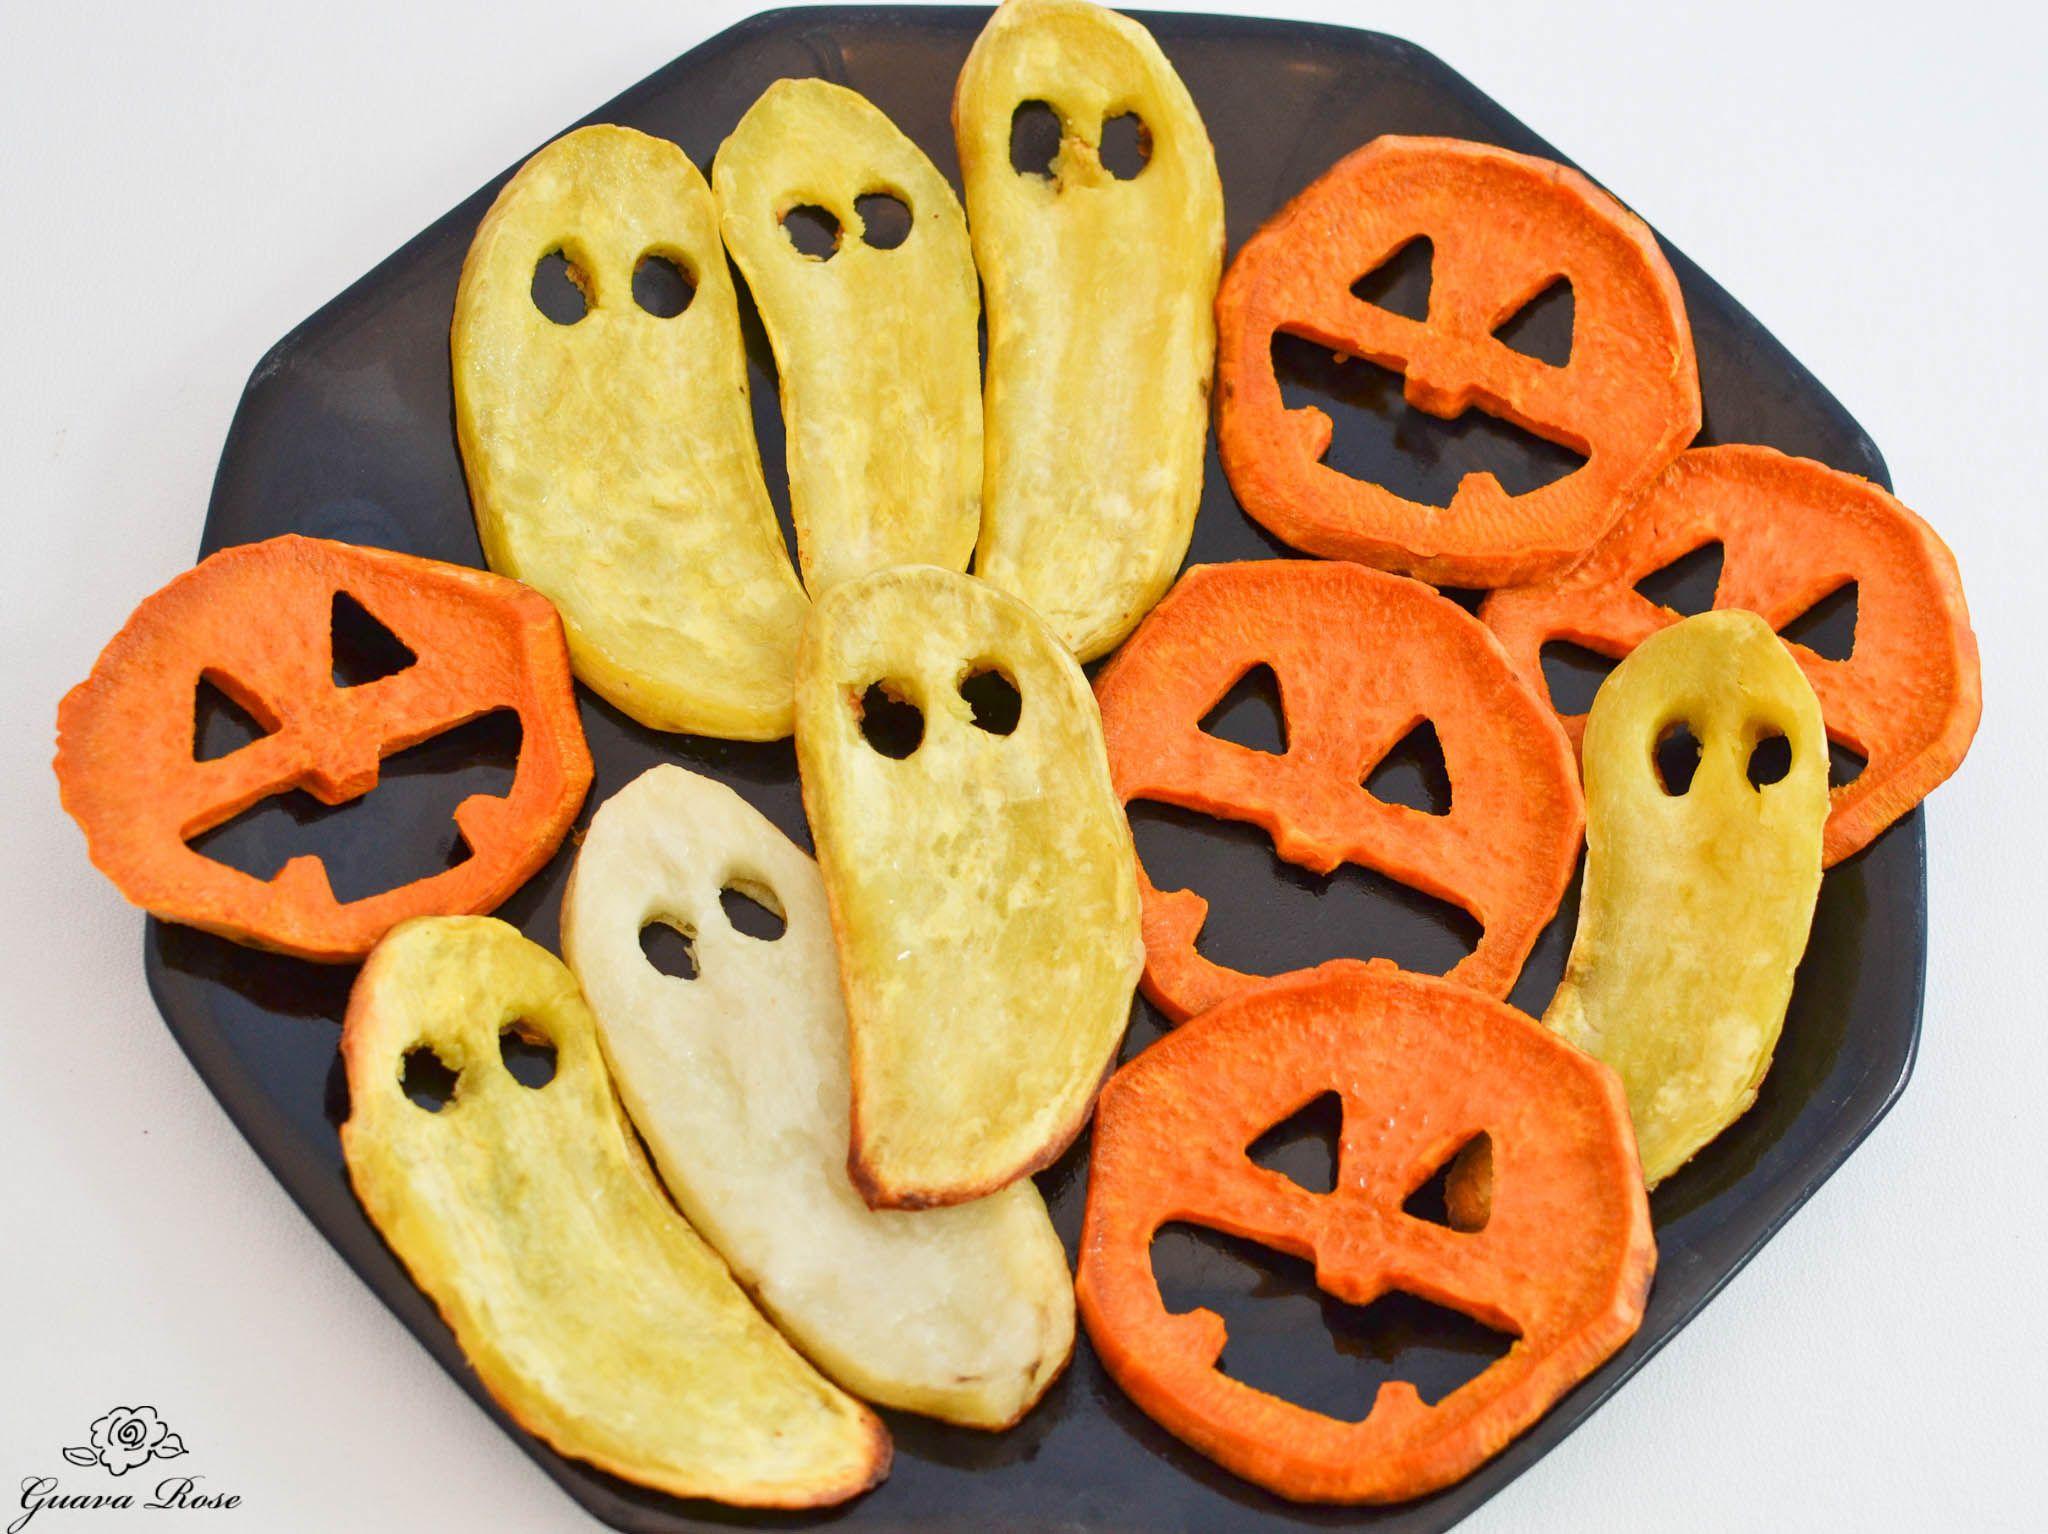 Roasted Sweet Potato Jack-o-Lantern Faces and Ghosts Recipe